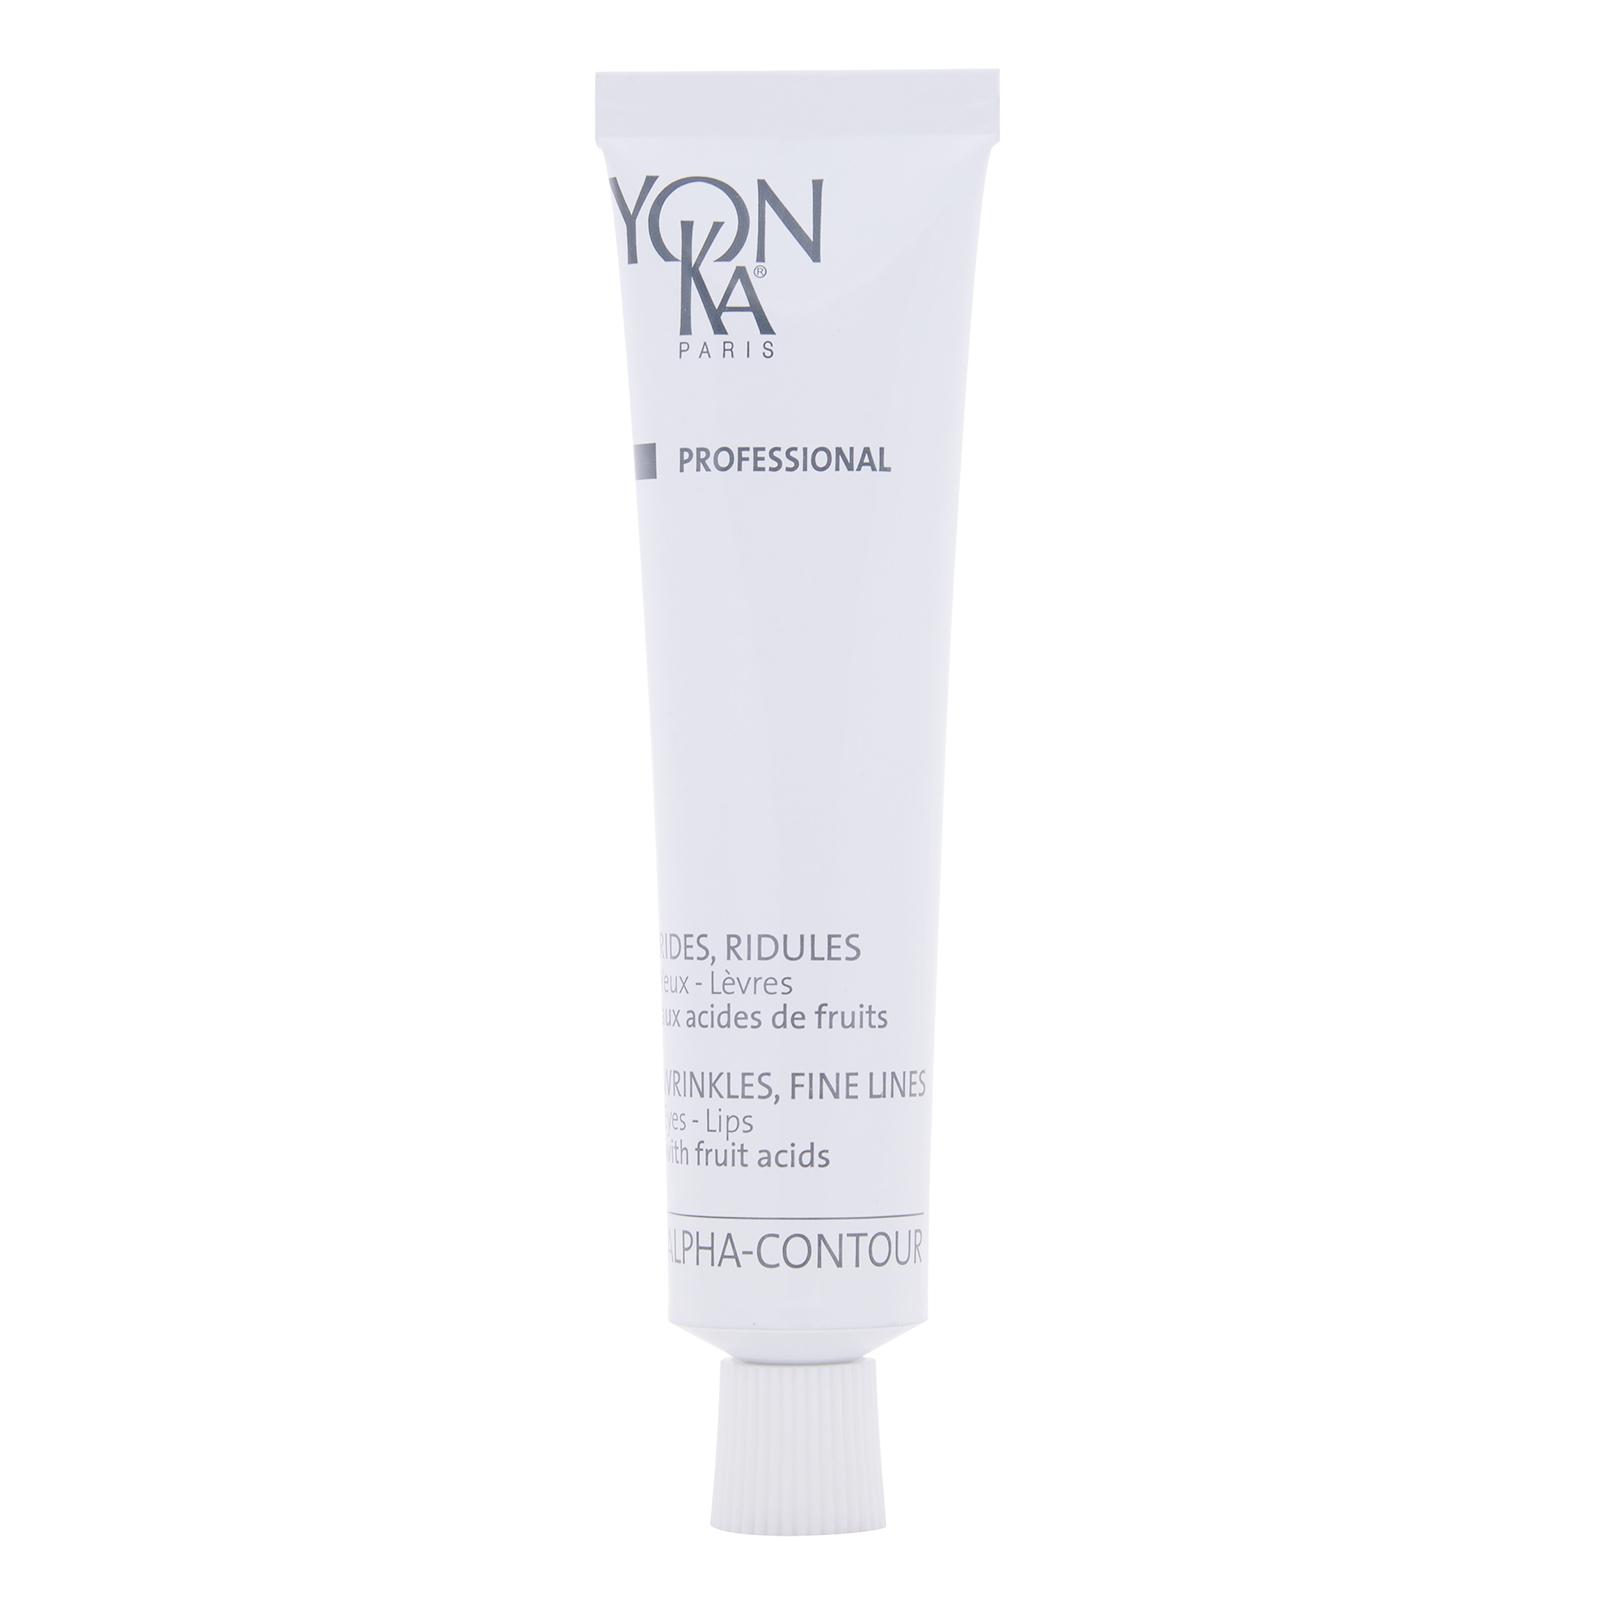 YON-KA Professional  Alpha-Contour Eyes-Lips (Wrinkles, Fine Lines) 0.91oz, 25ml